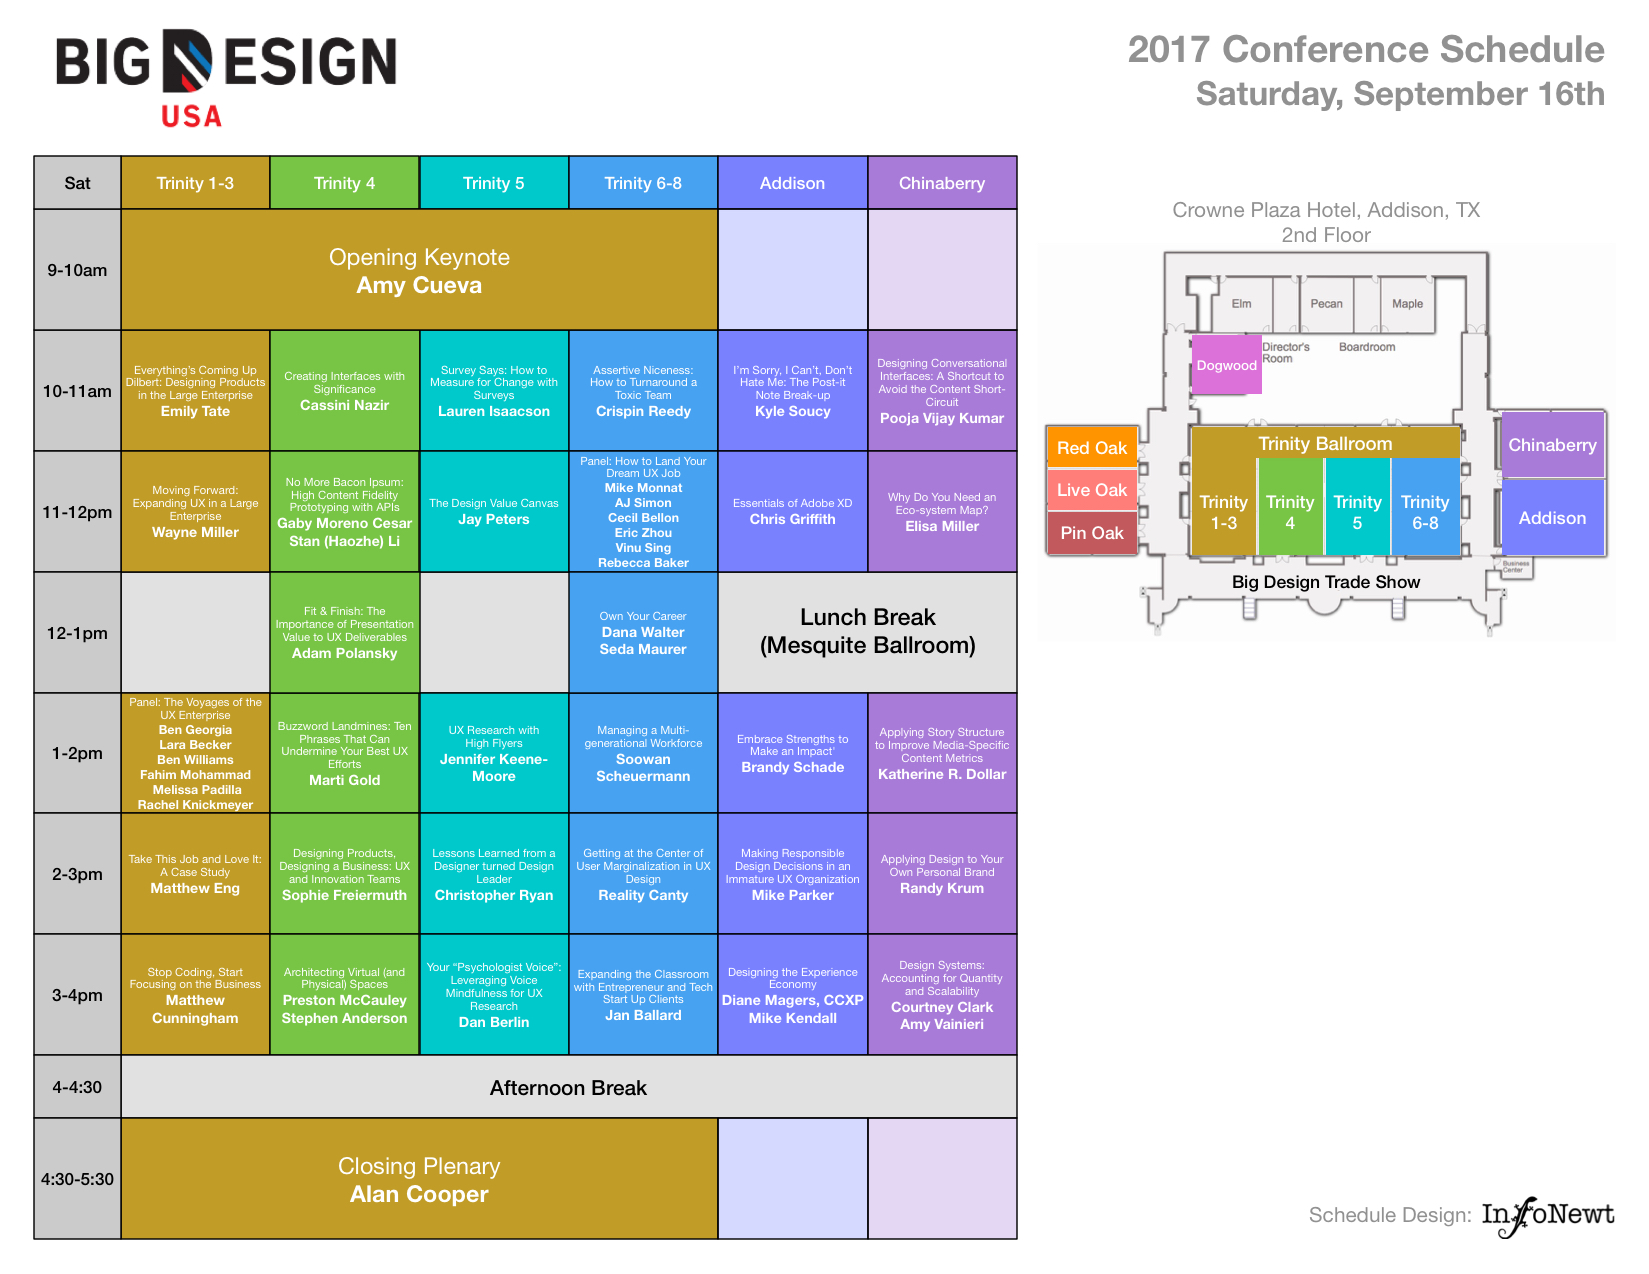 Big Design Conference 2017 Schedule